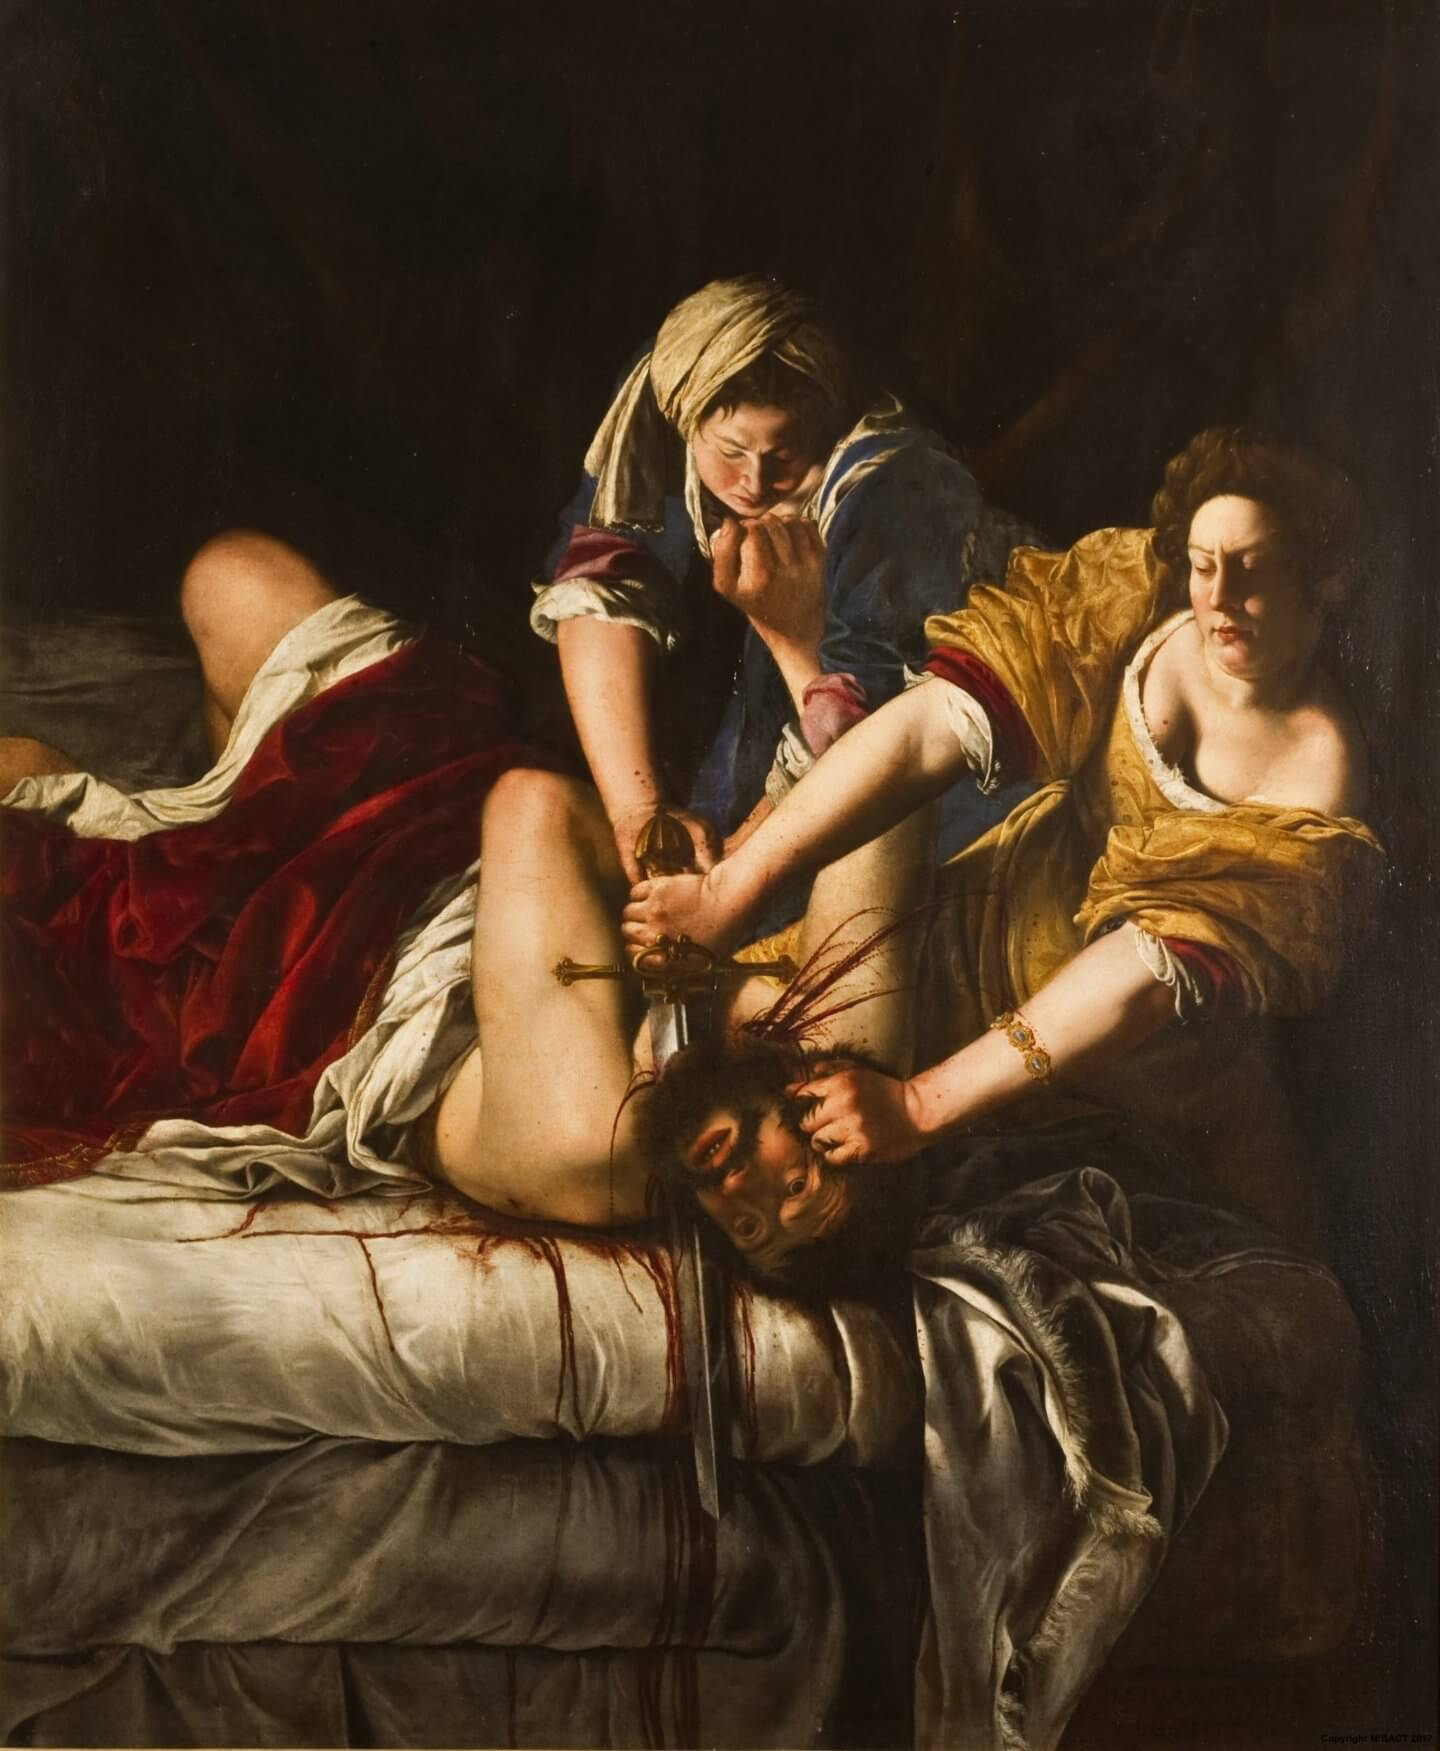 Артемизия Джентилески. Юдифь, обезглавливающая Олоферна. 1618. Холст, масло. Галерея Палатина, палаццо Питти, Флоренция